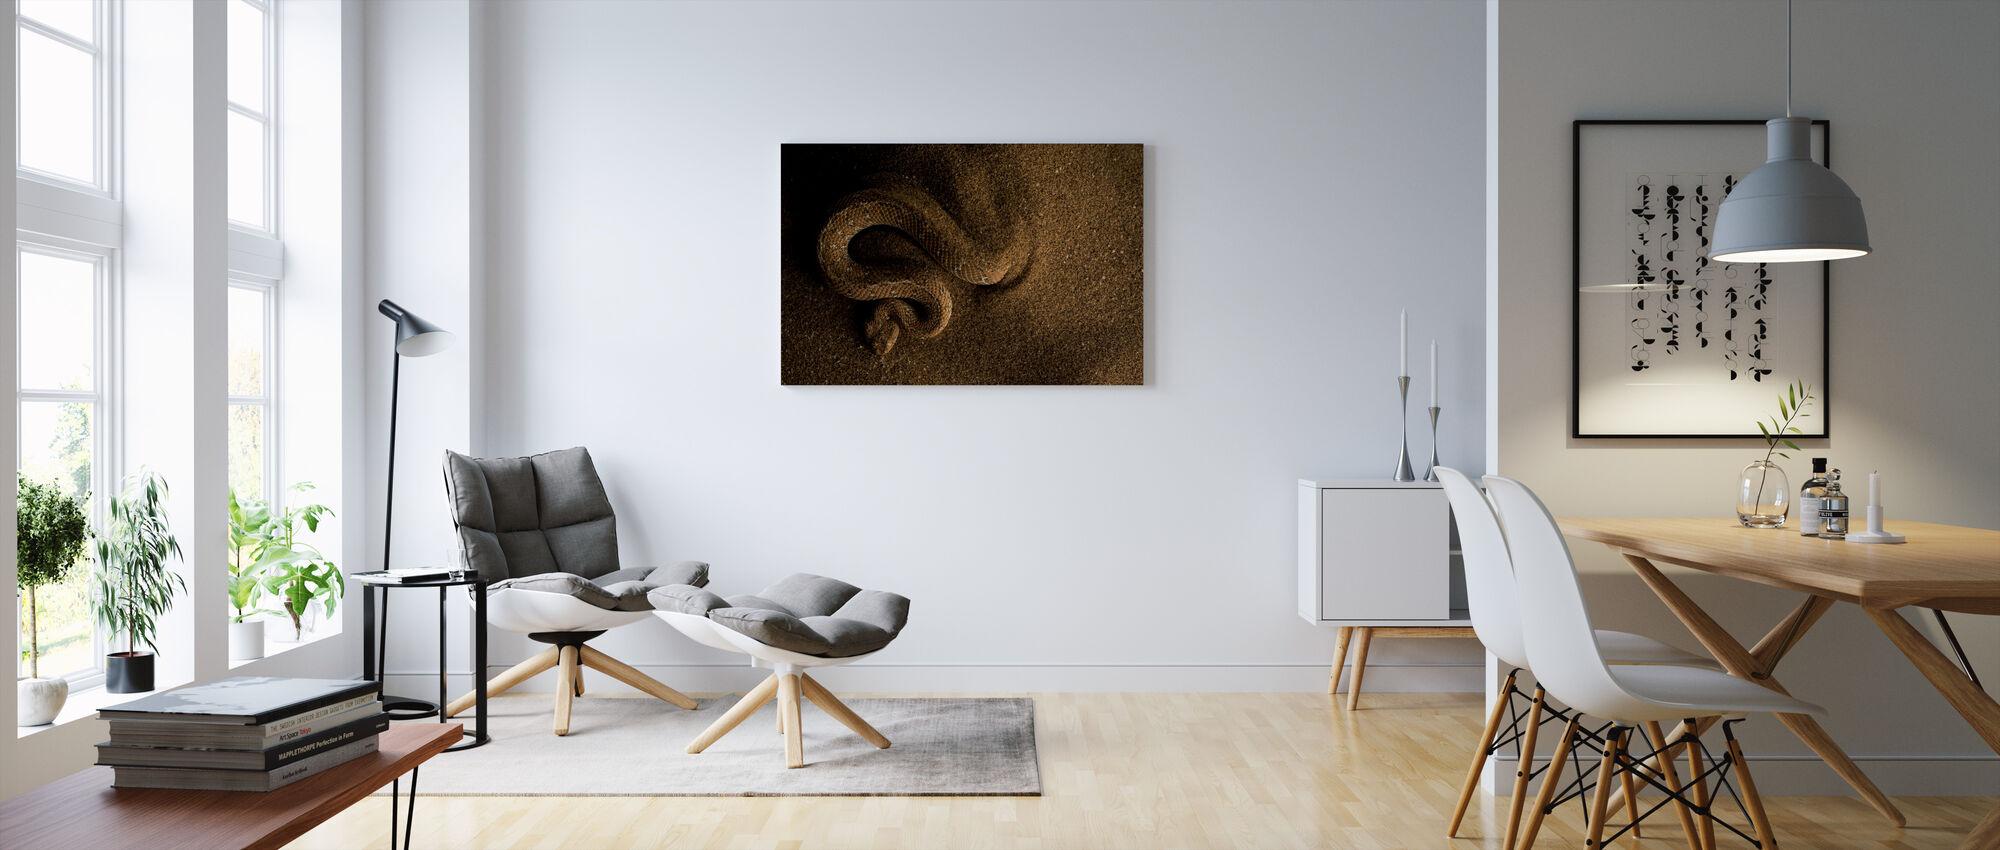 Peringuey's Adder - Canvas print - Living Room